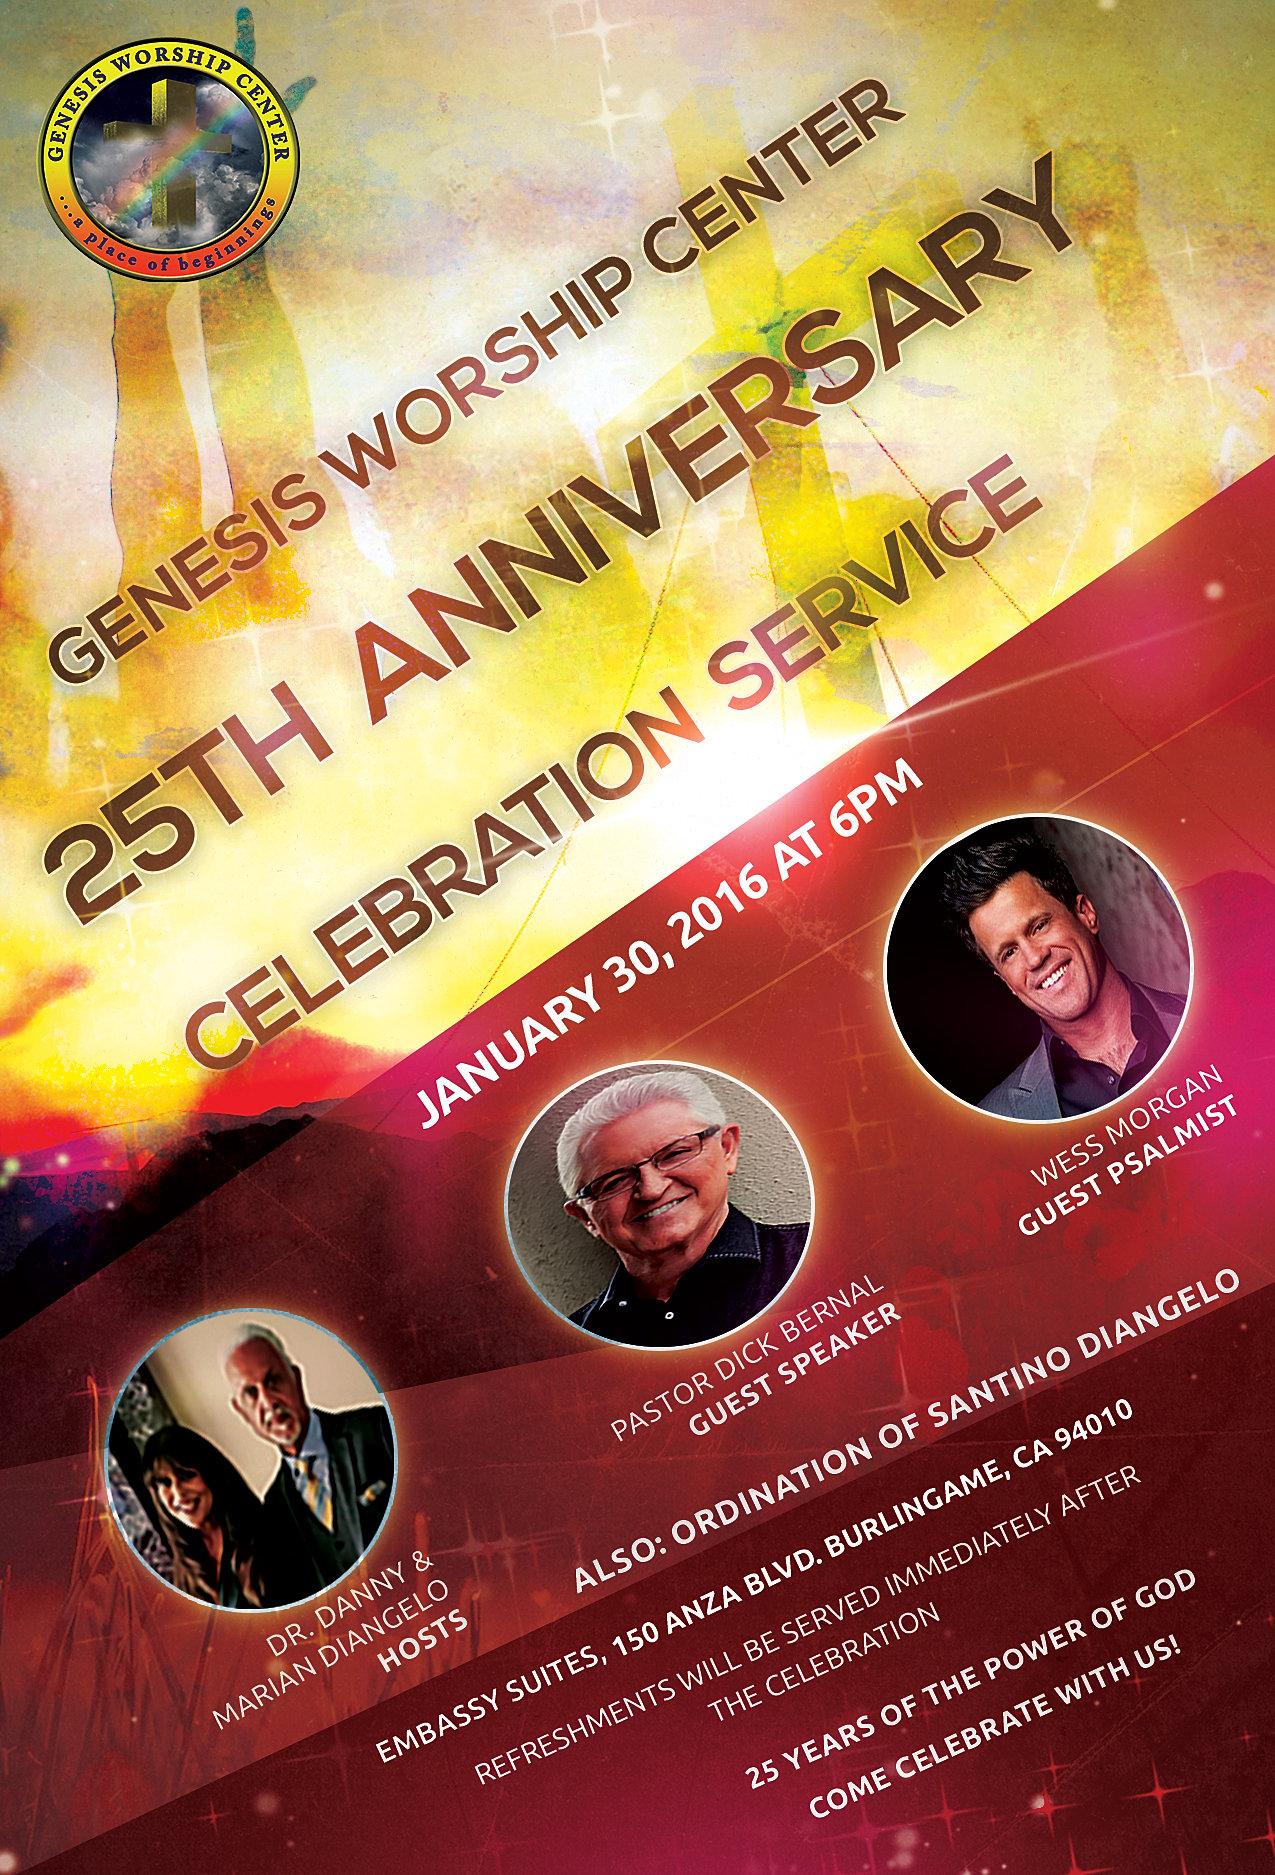 genesis worship center church flyer main jpg genesis worship center church flyer main 1 jpg